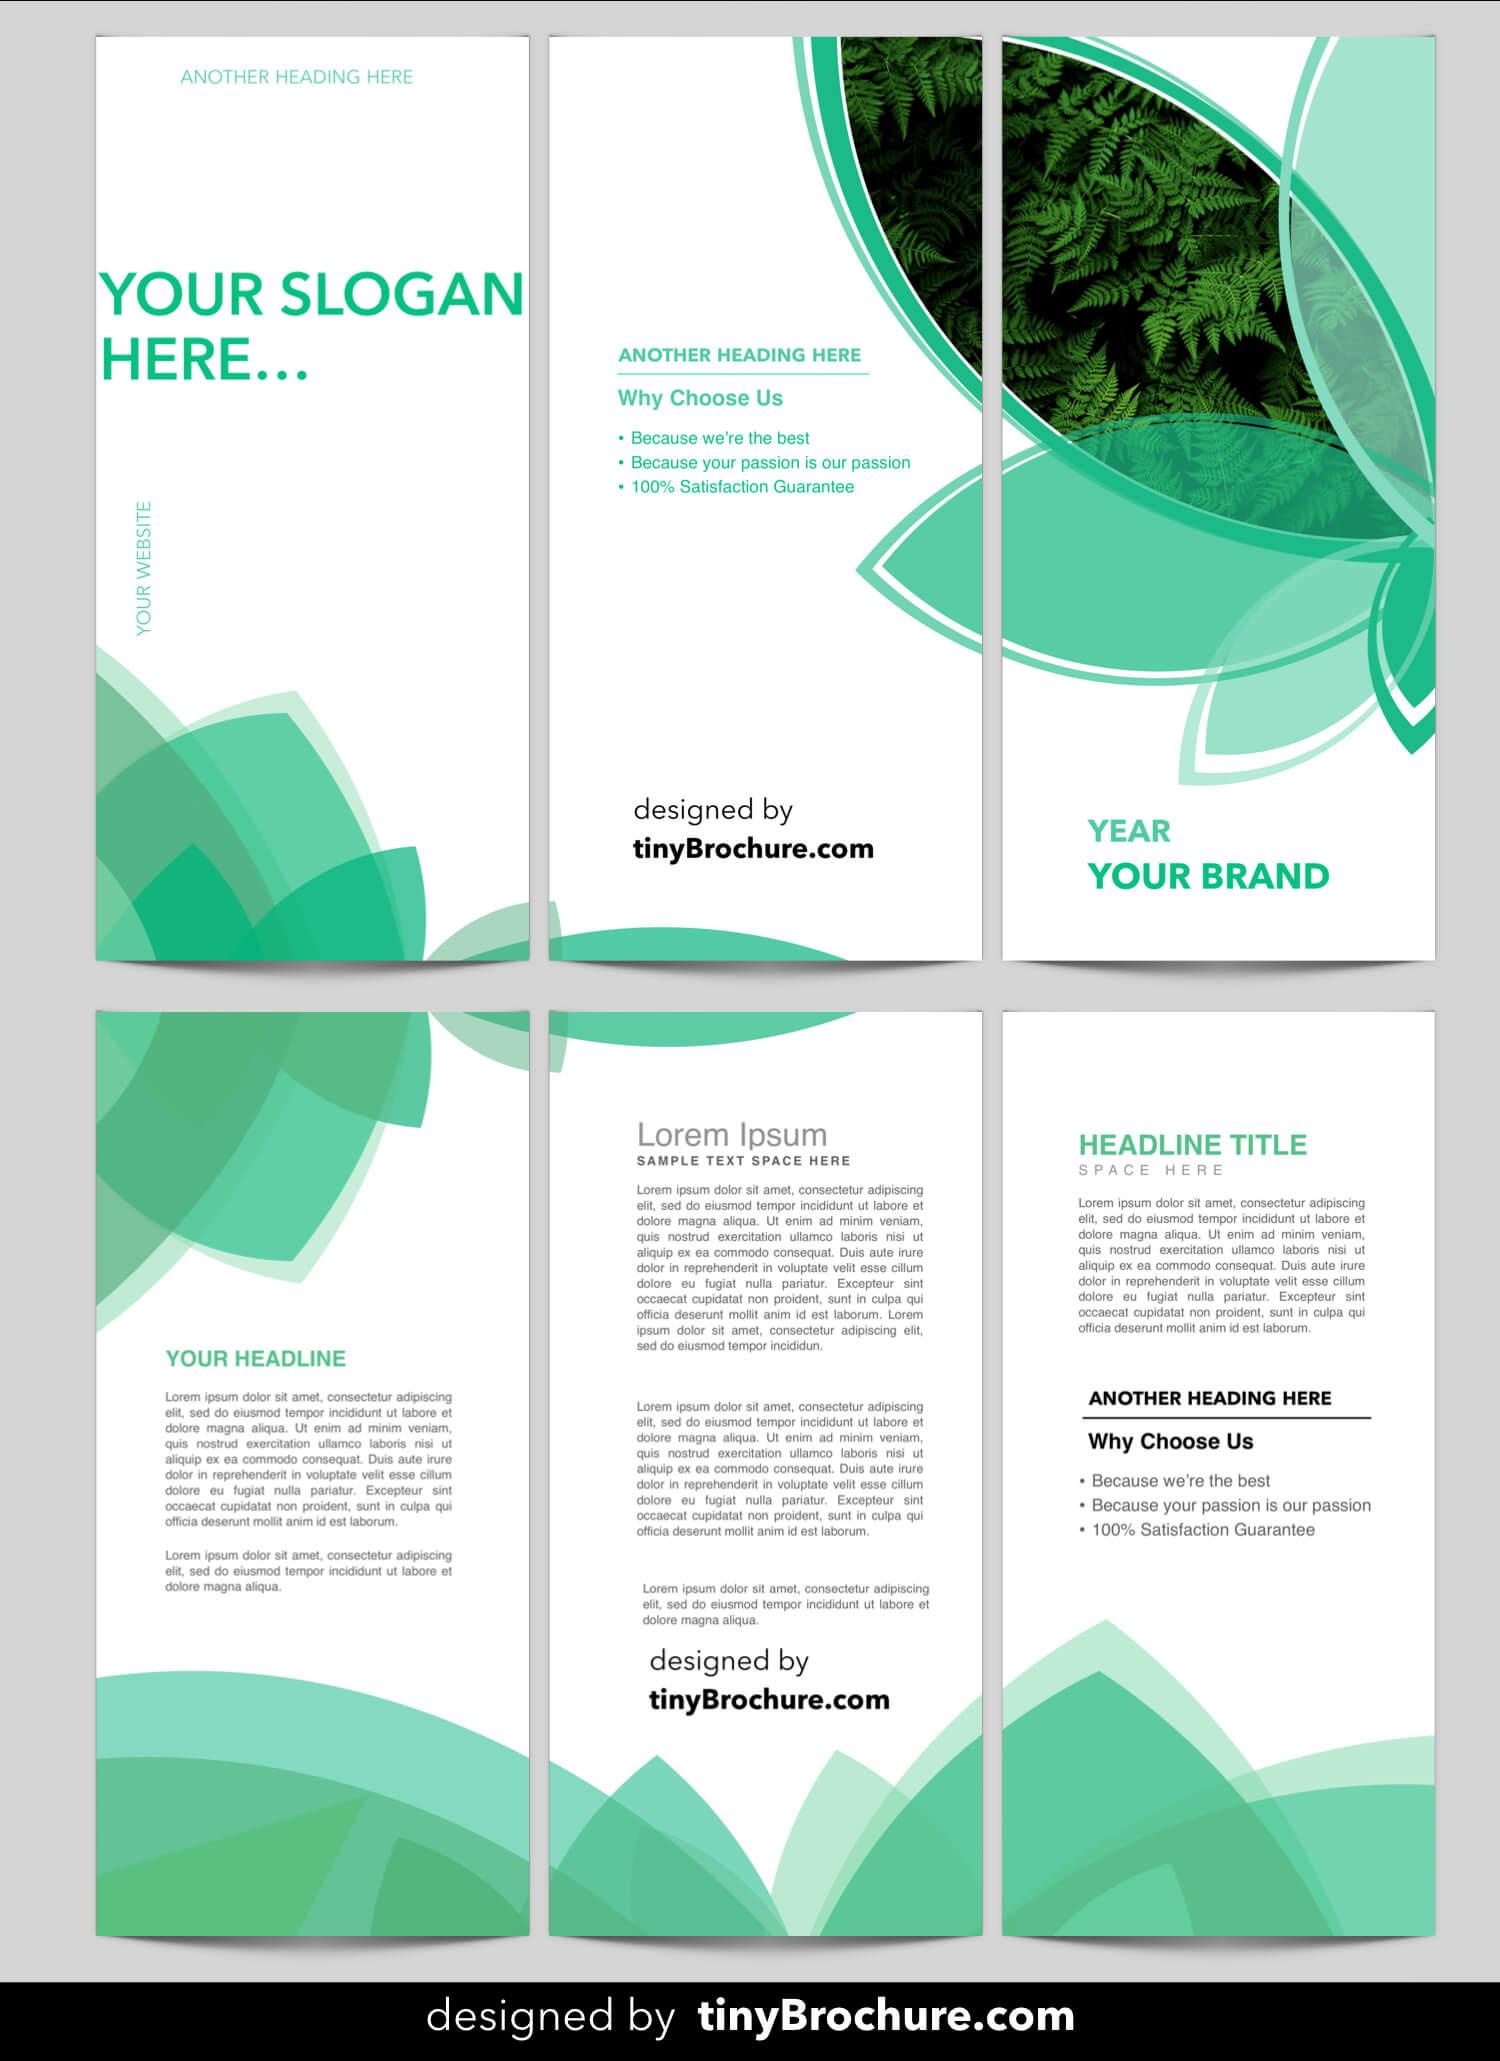 3 Panel Brochure Template Word Format Free Download With Regard To Three Panel Brochure Template